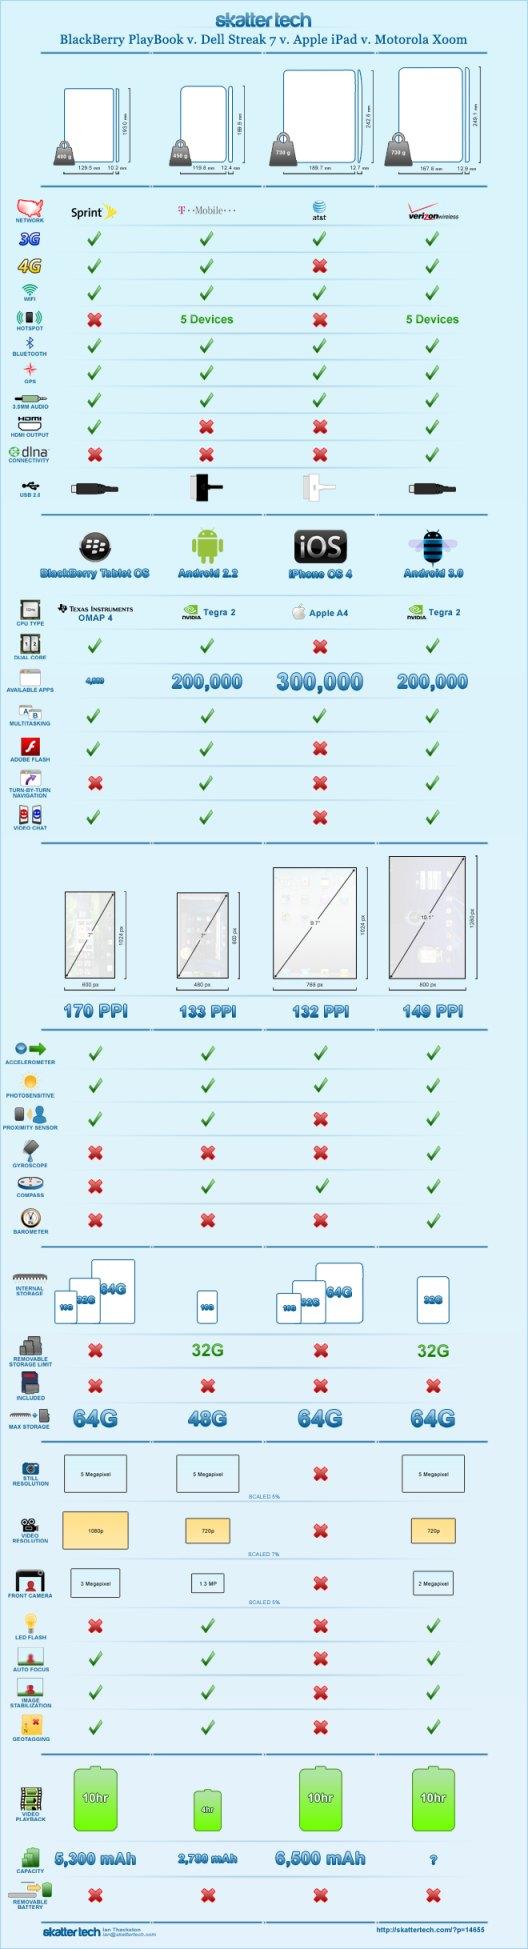 infografia-playbook-vs-streak-vs-ipad-vs-xoom-small